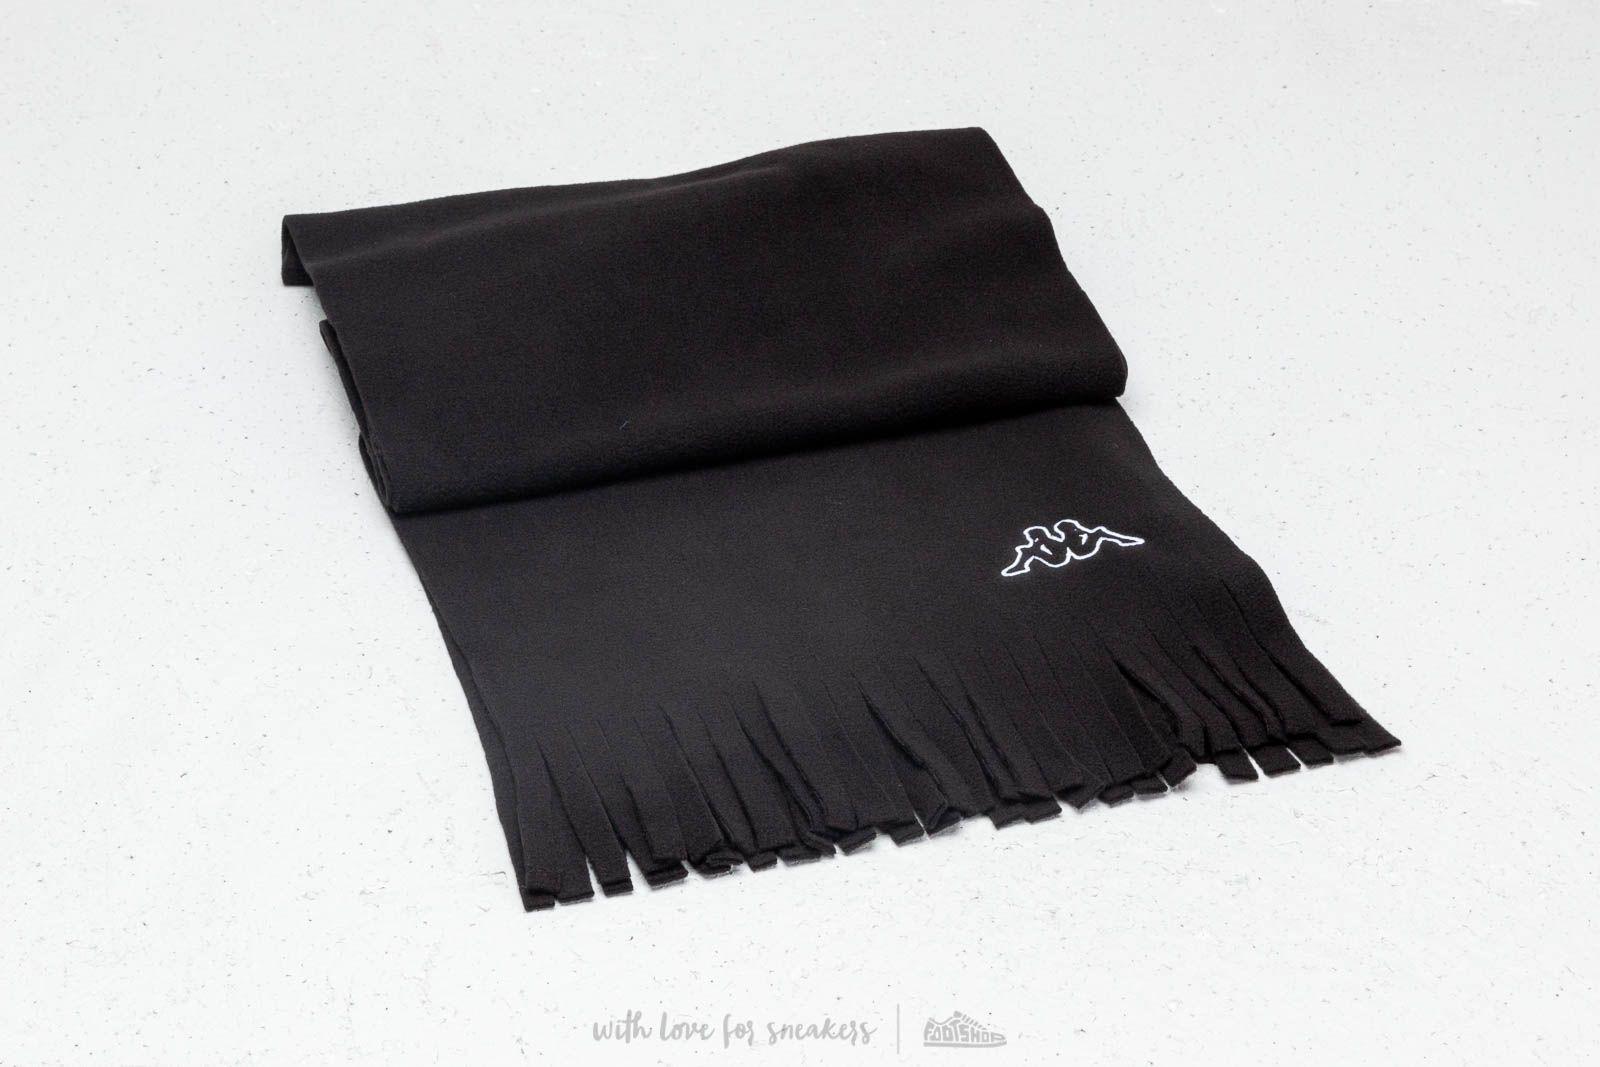 Kappa Logo Scarf Black at a great price 16 € buy at Footshop